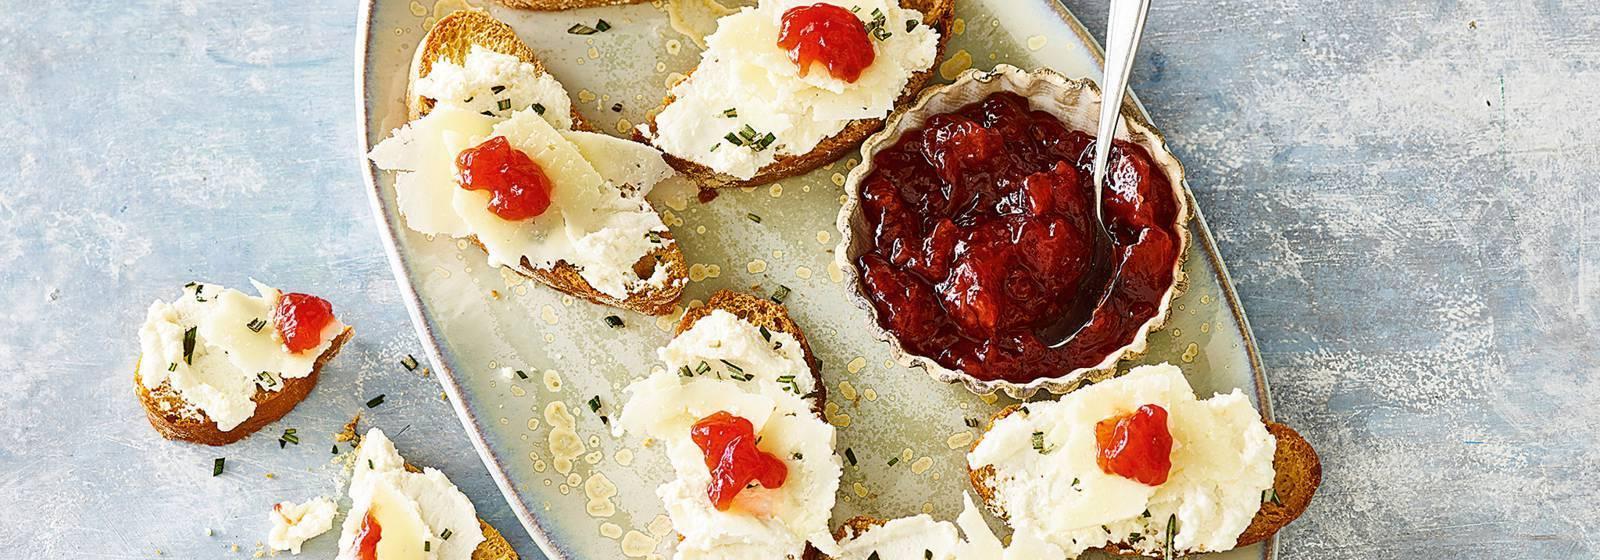 Bruschette with ricotta and strawberry jam